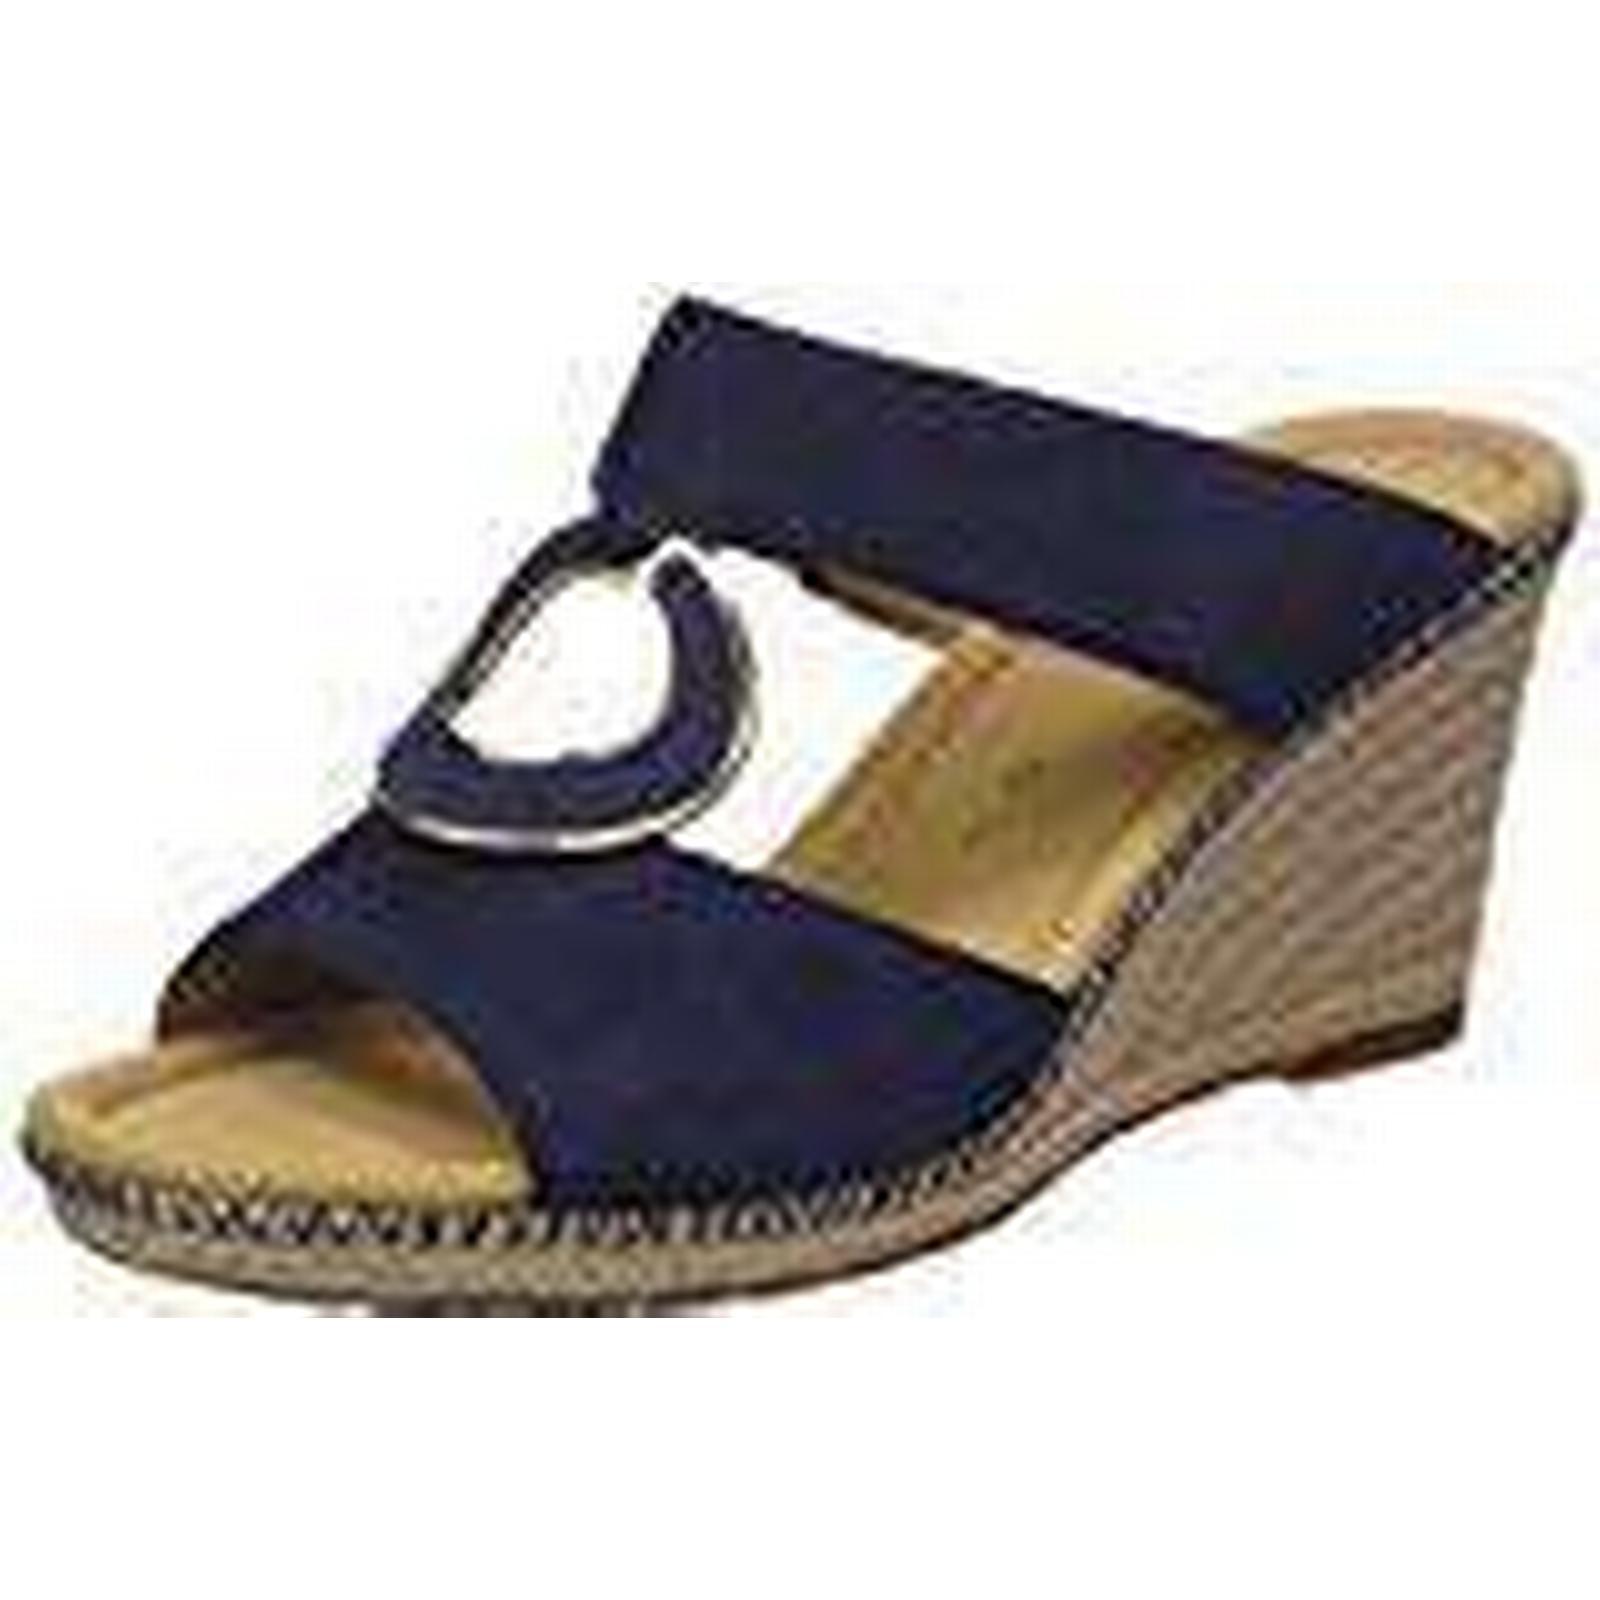 Gabor Shoes Women Comfort Jute/Naht), Sport Mules, Blue (Blue Jute/Naht), Comfort 4.5 UK (37.5 EU) 296ea0